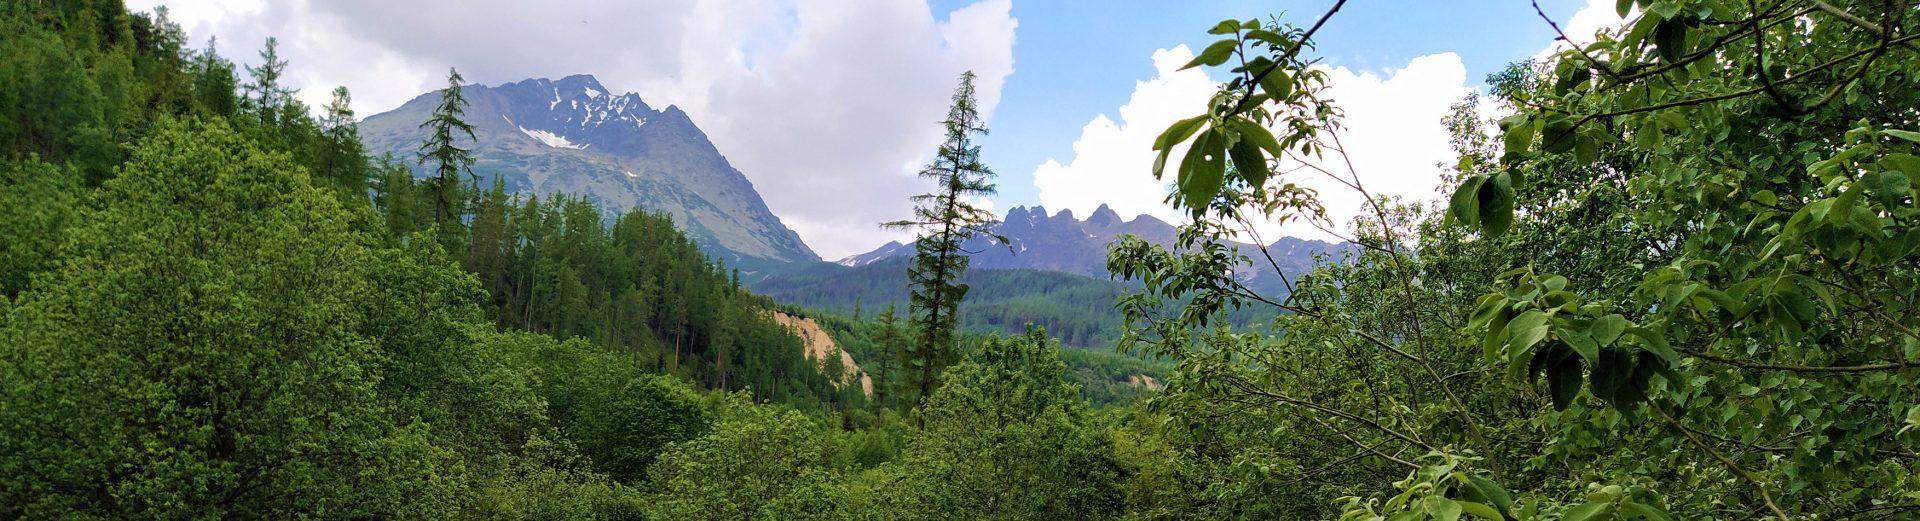 tatranska polianka rozpravka gerlach